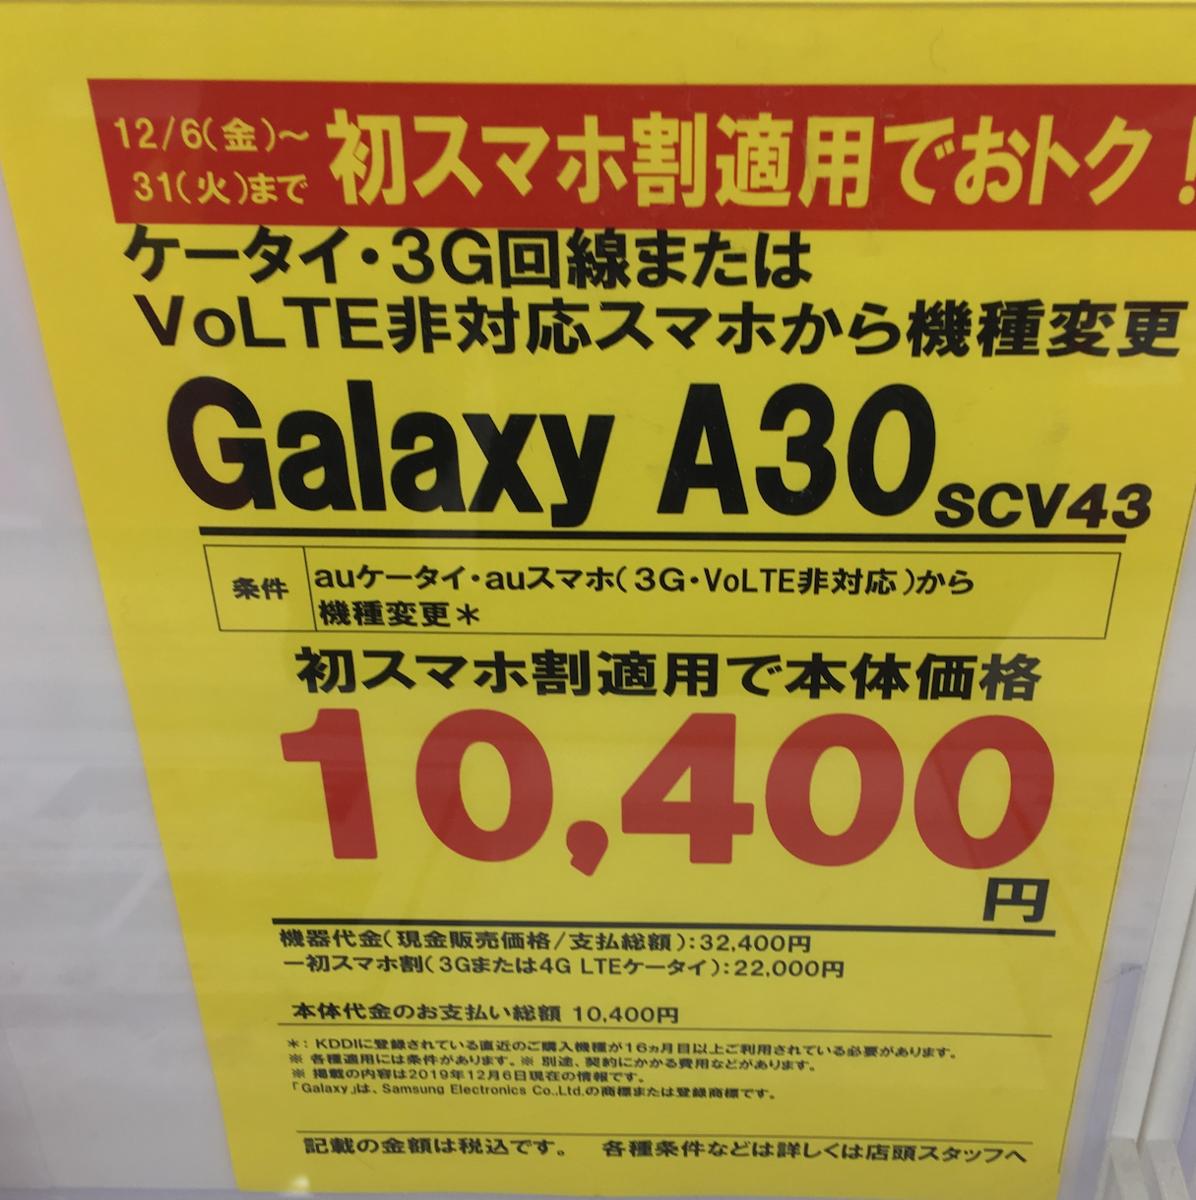 f:id:koiwai_chinatsu:20191220183735p:plain